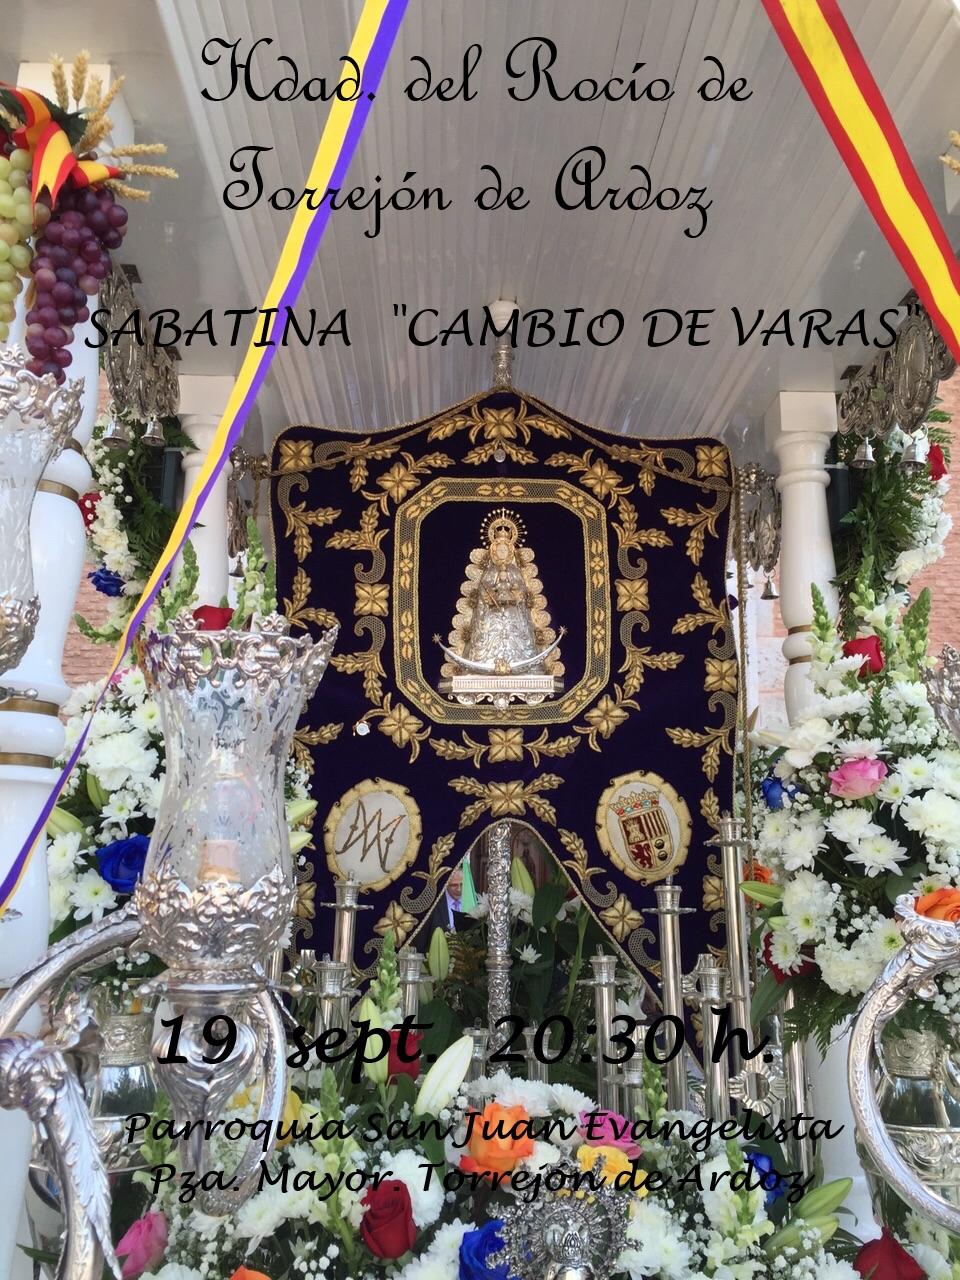 Torrejon-2015-cartel sabatina cambio varas 2015 torrejon